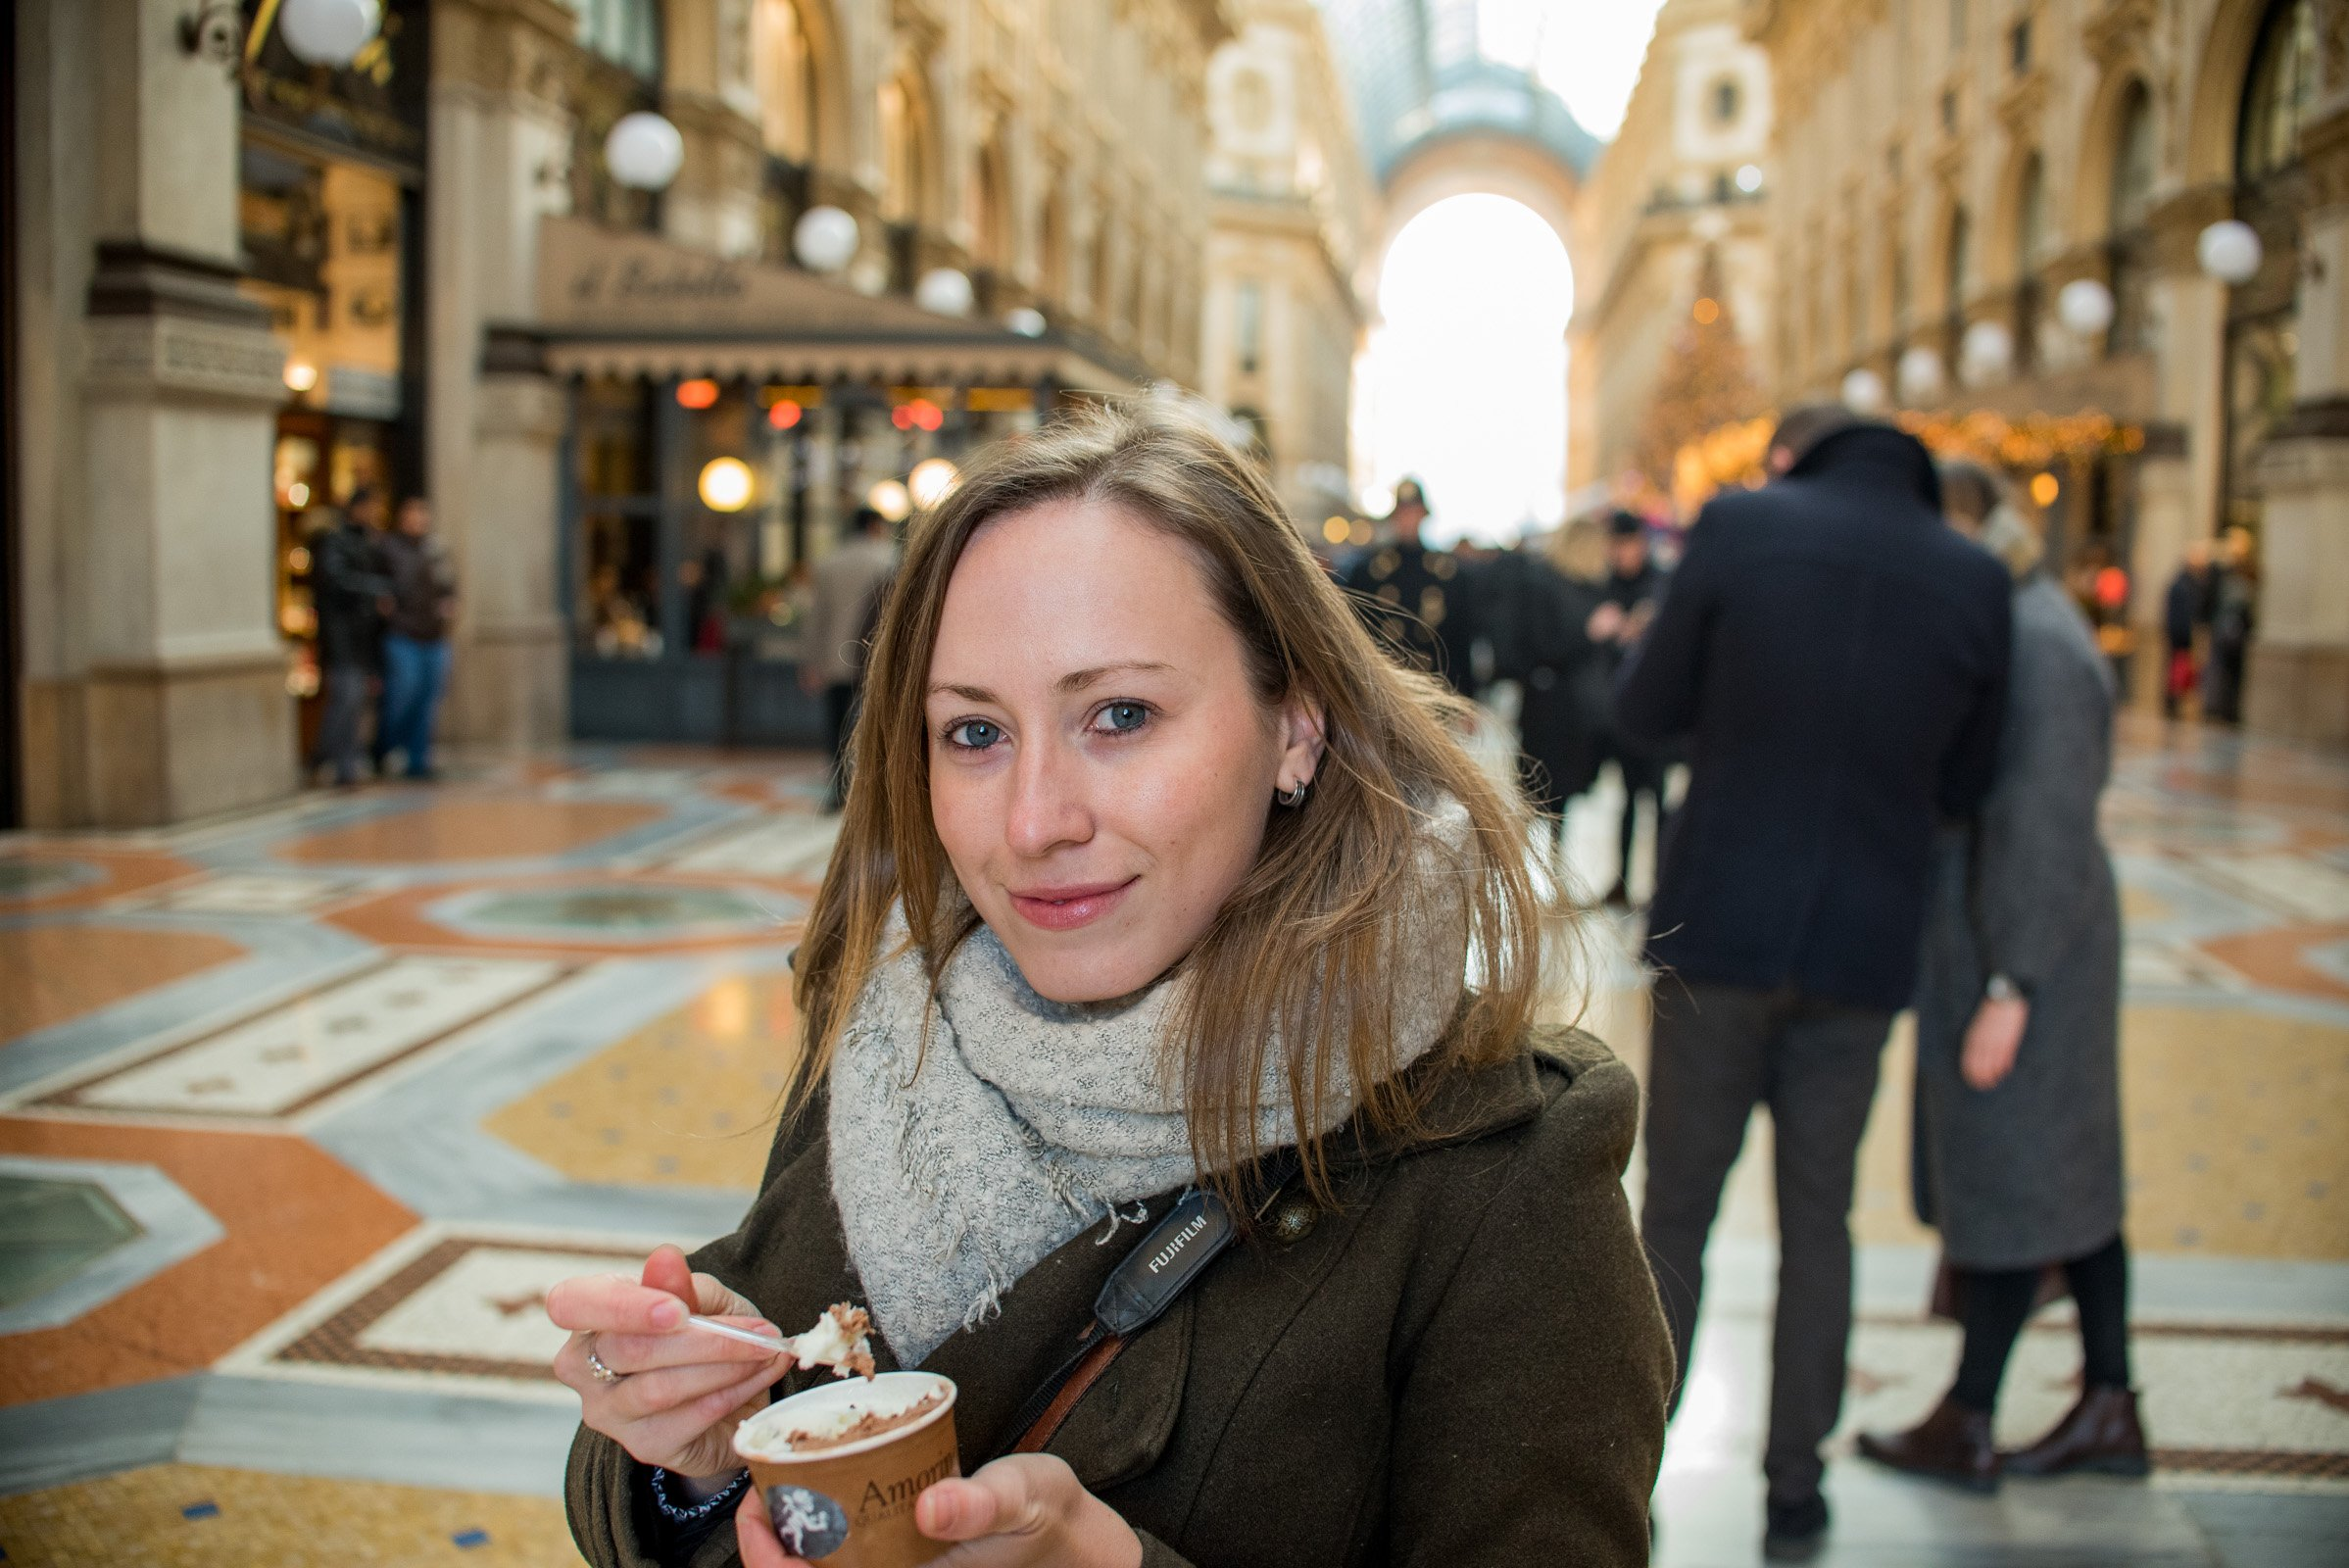 Eating Gelato in Galleria Vittorio Emanuele II - Travel Notes on Milan, Italy